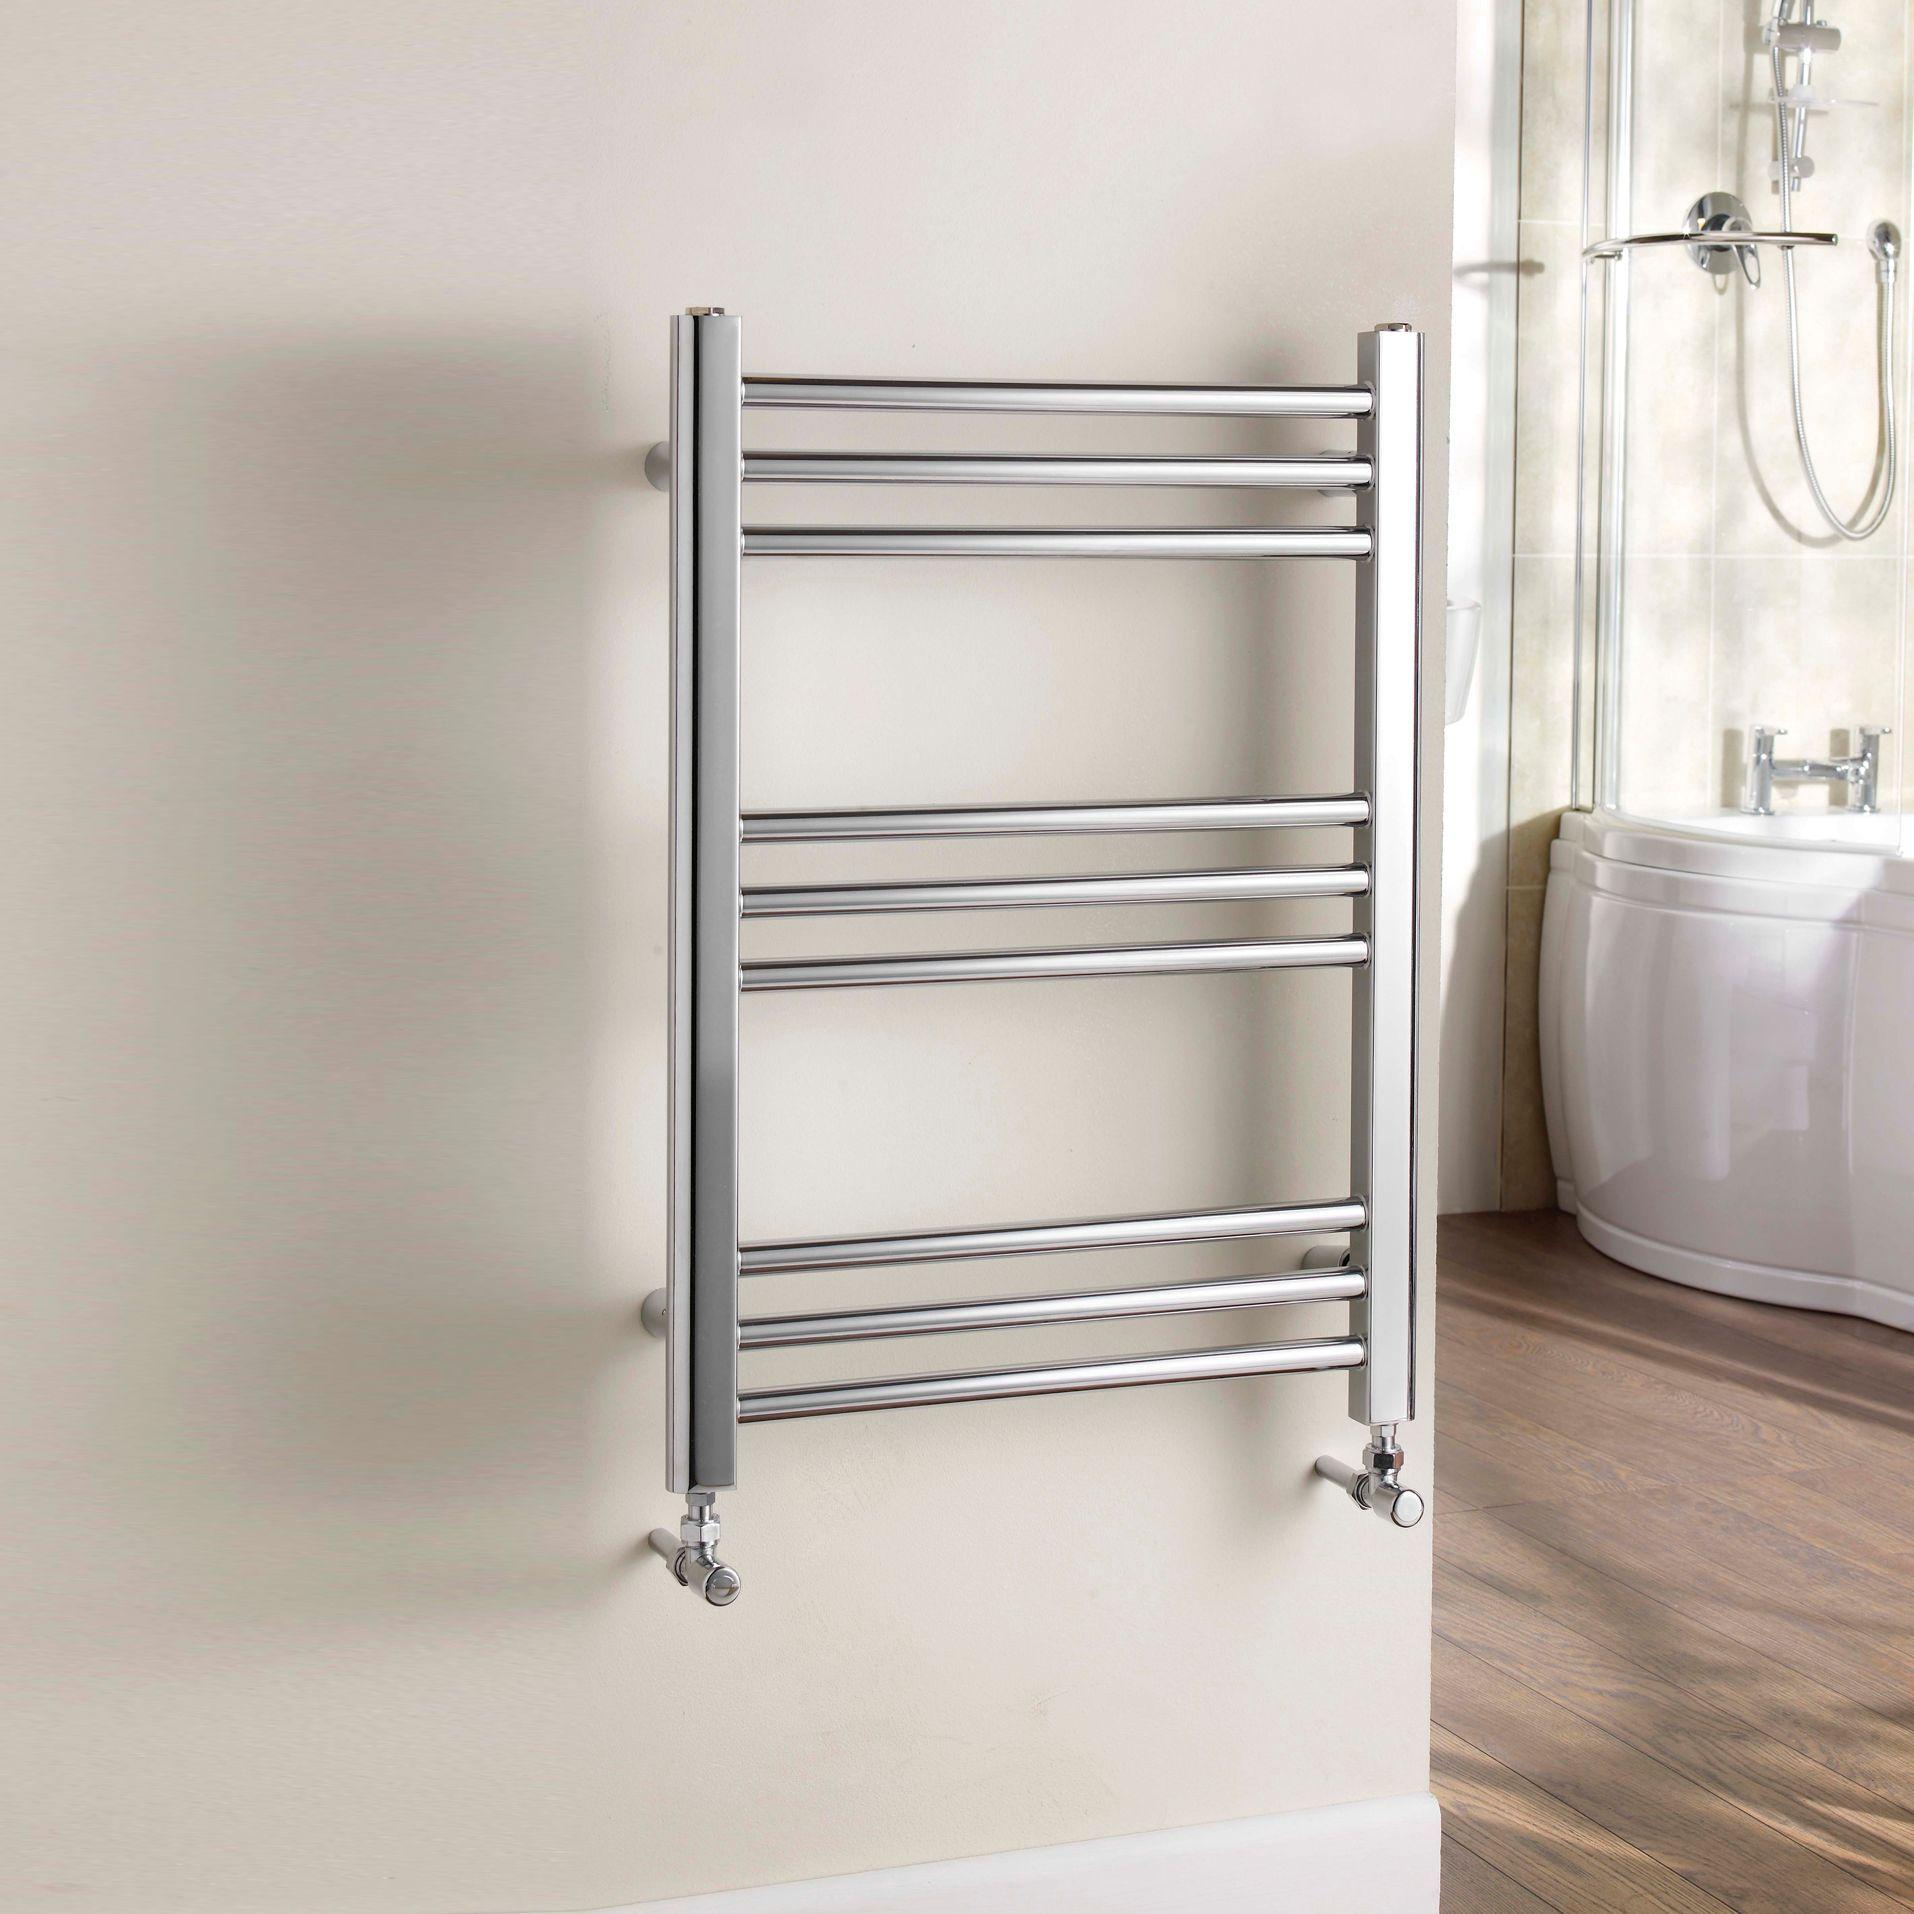 Small heated towel rails for bathrooms - Heated Towel Rail In Chrome B Q Kudox Timeless Towel Warmer Chrome